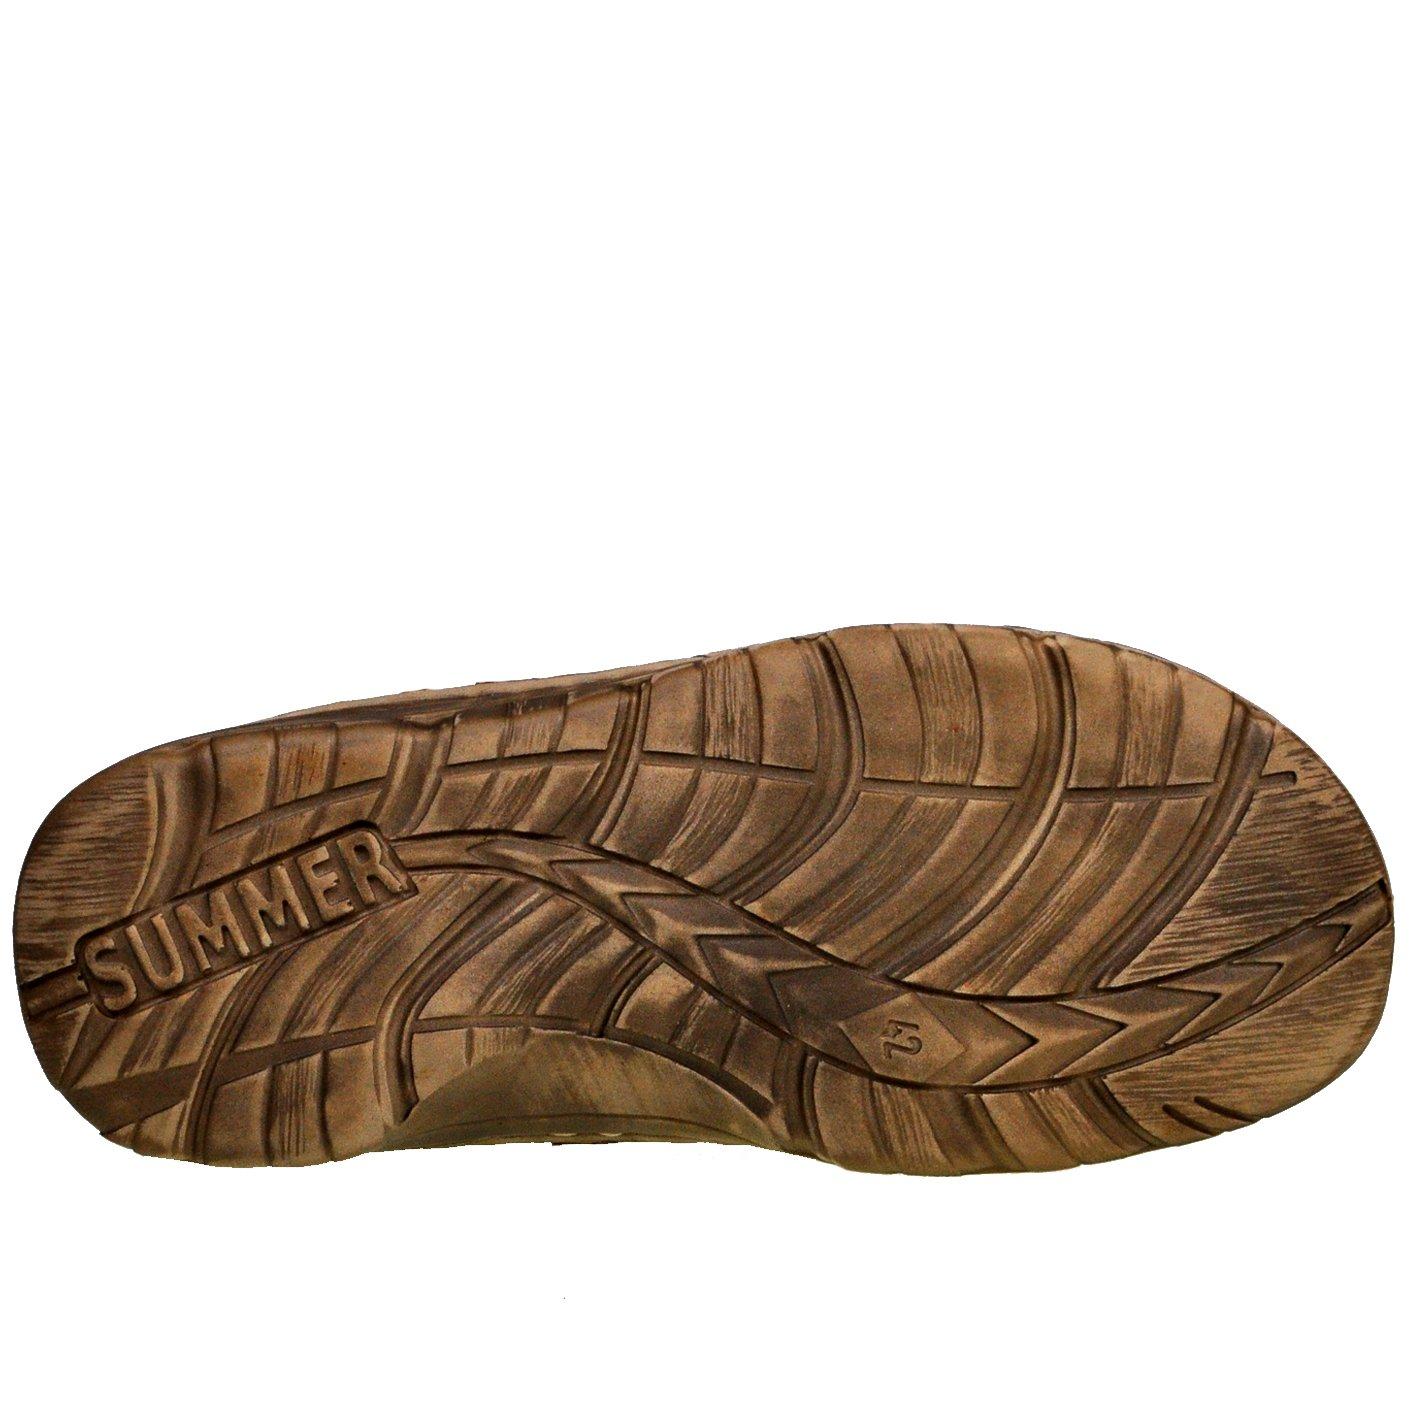 78f129eabd5 Lukpol Genuine Buffalo Leather Mens Sandals Shoes Comfy Orthopedic Footwear  Model-868 larger image